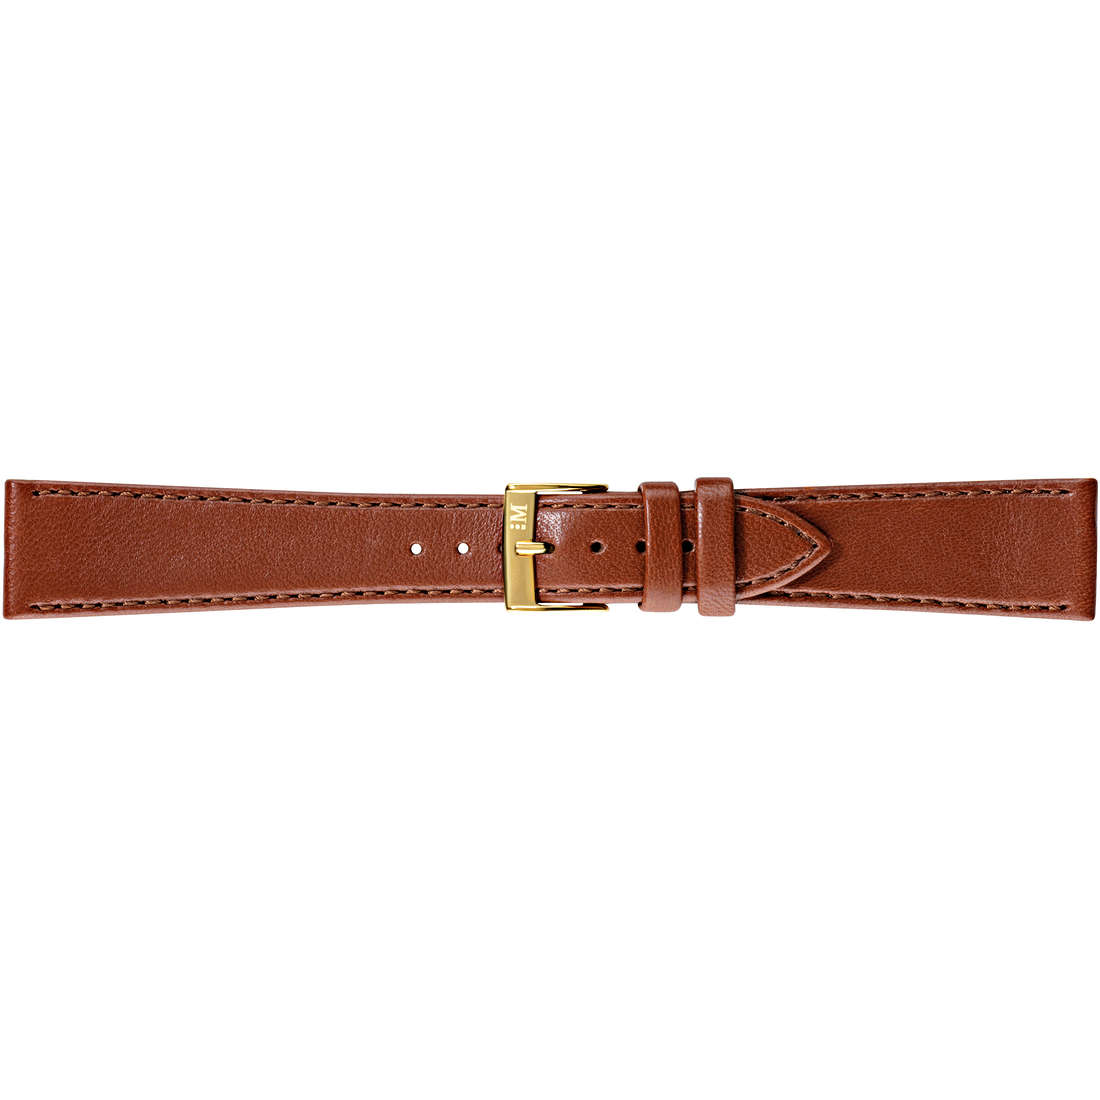 watch watch bands watch straps man Morellato Morellato 1930 A01U0770006041DO20